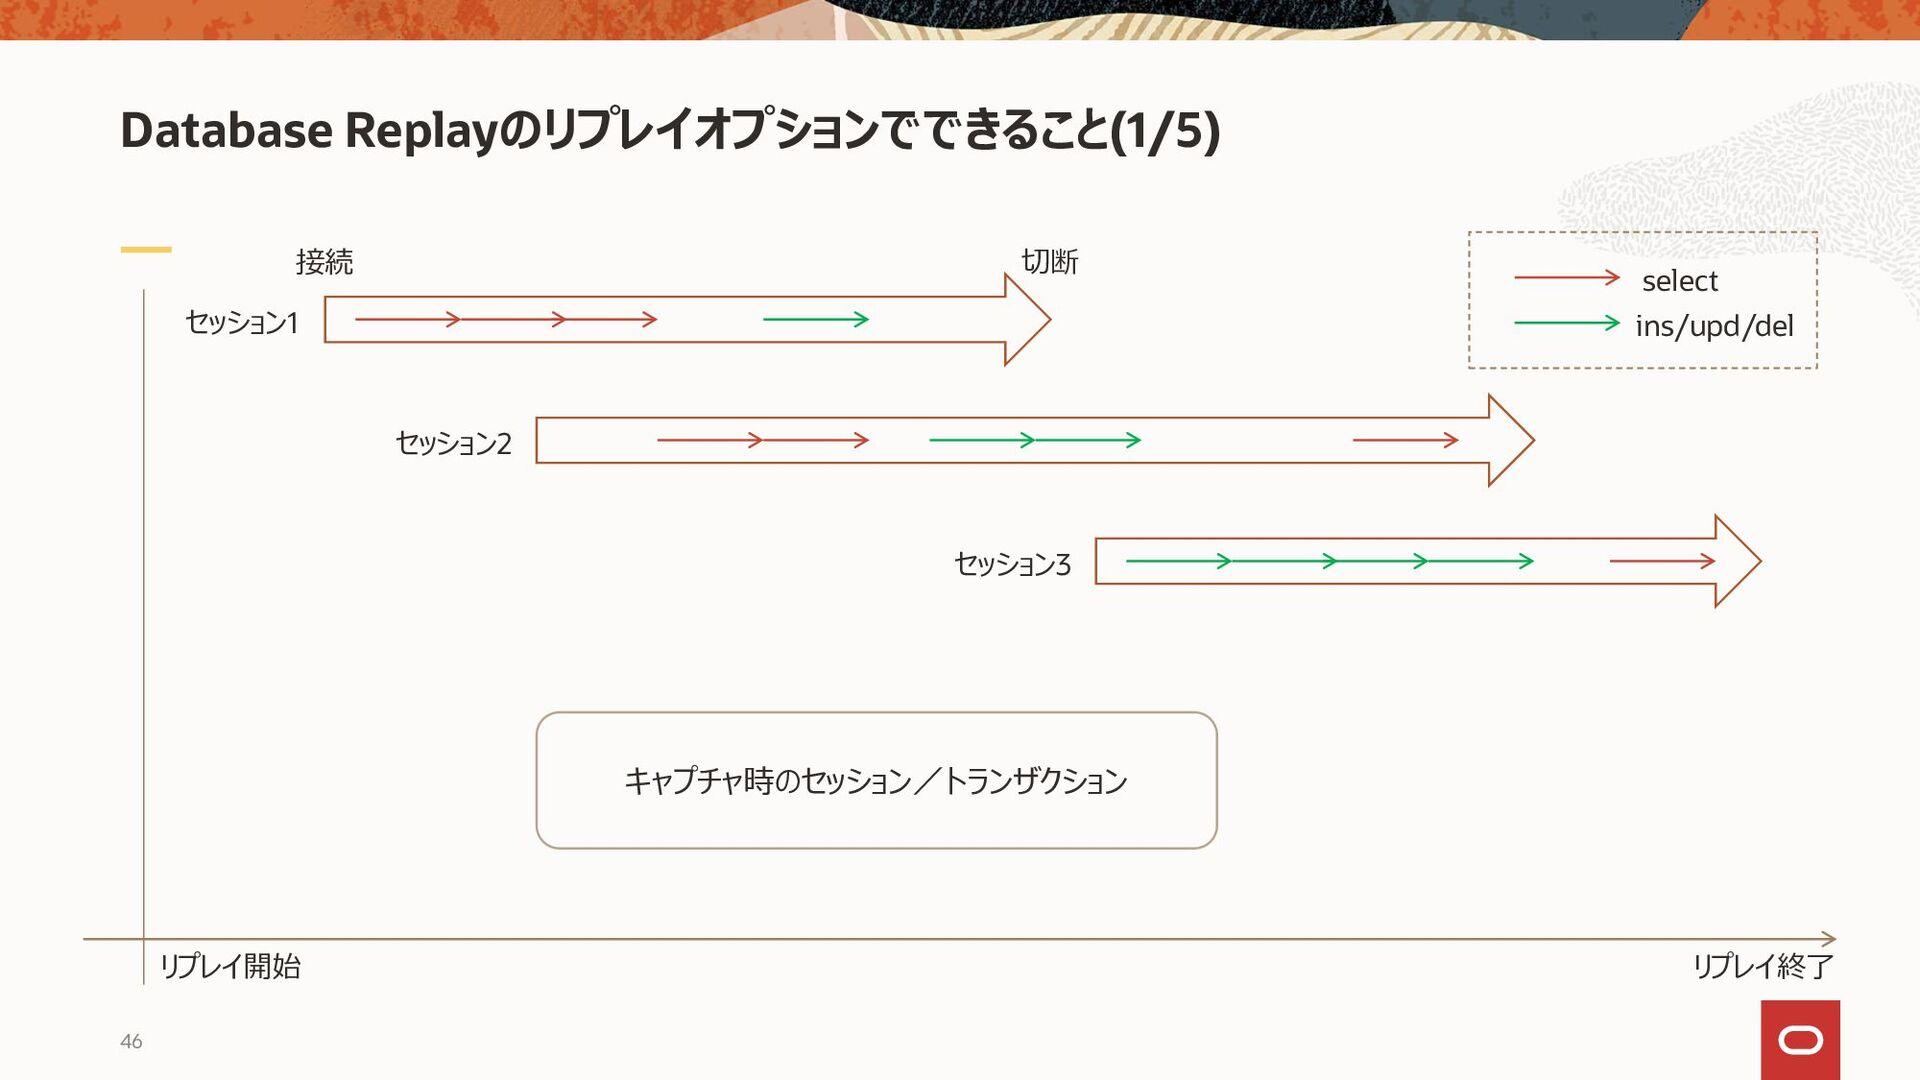 Database Replayのリプレイオプションでできること(2/5) 接続 切断 リプレイ...